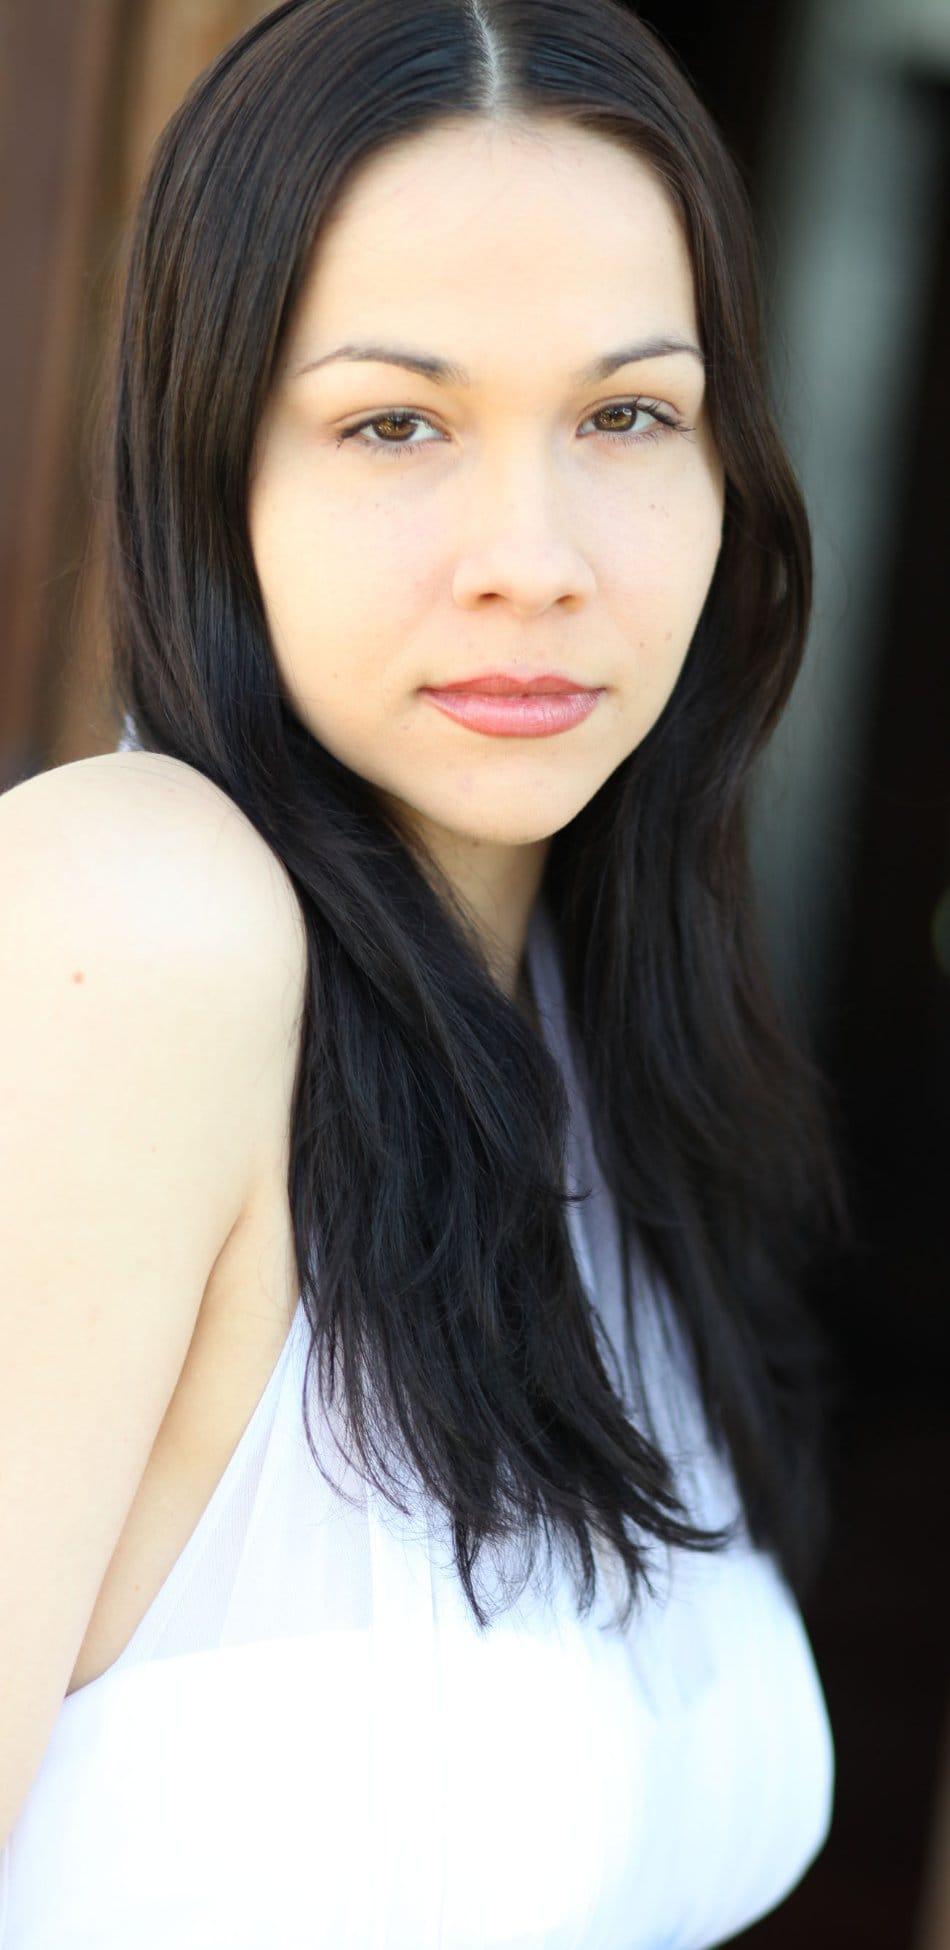 Ava Santana